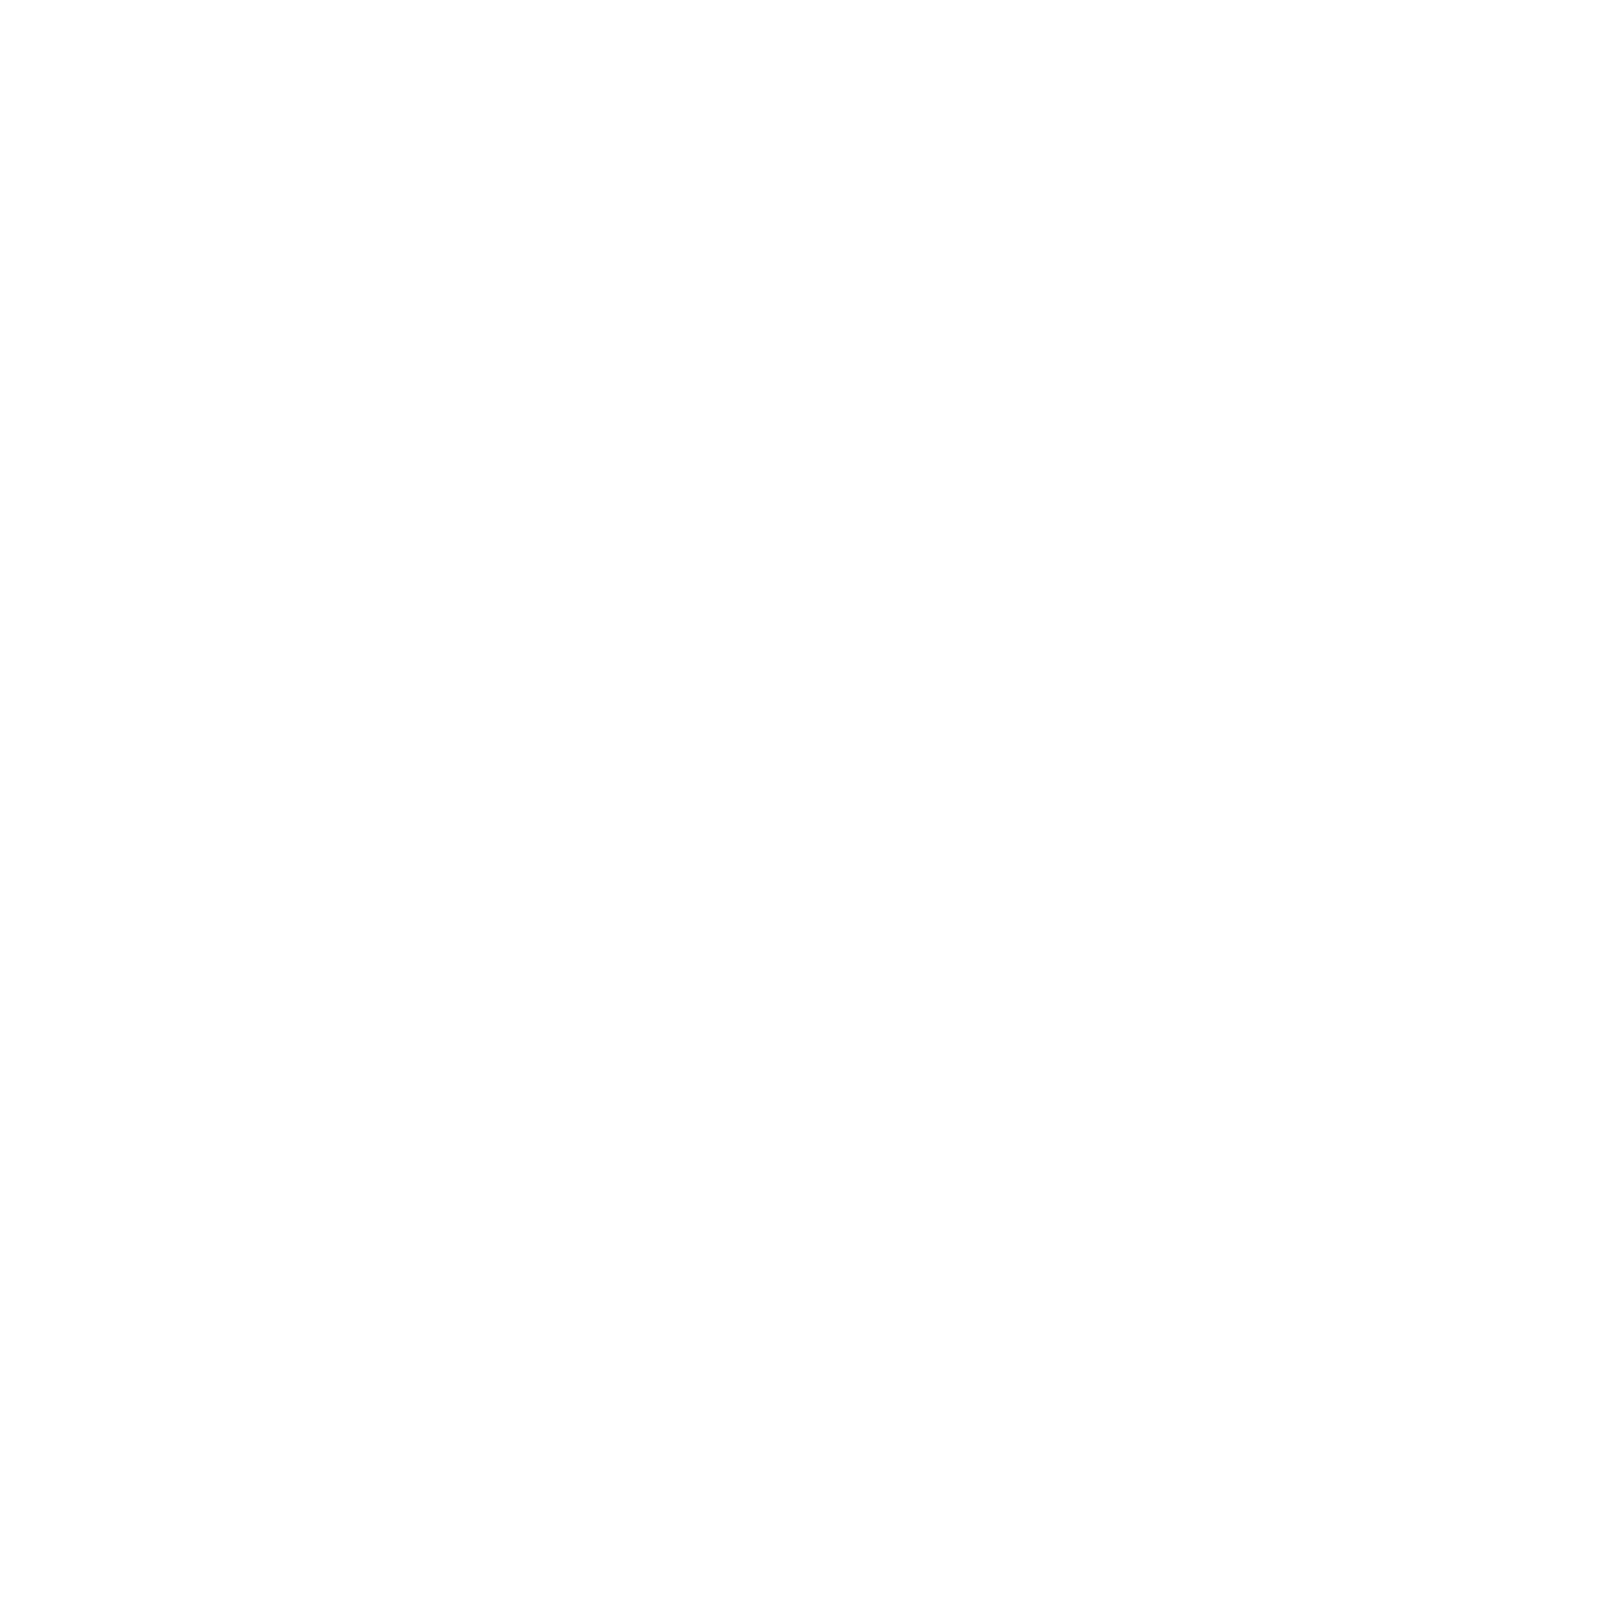 Adobe illustrator White@4x.png